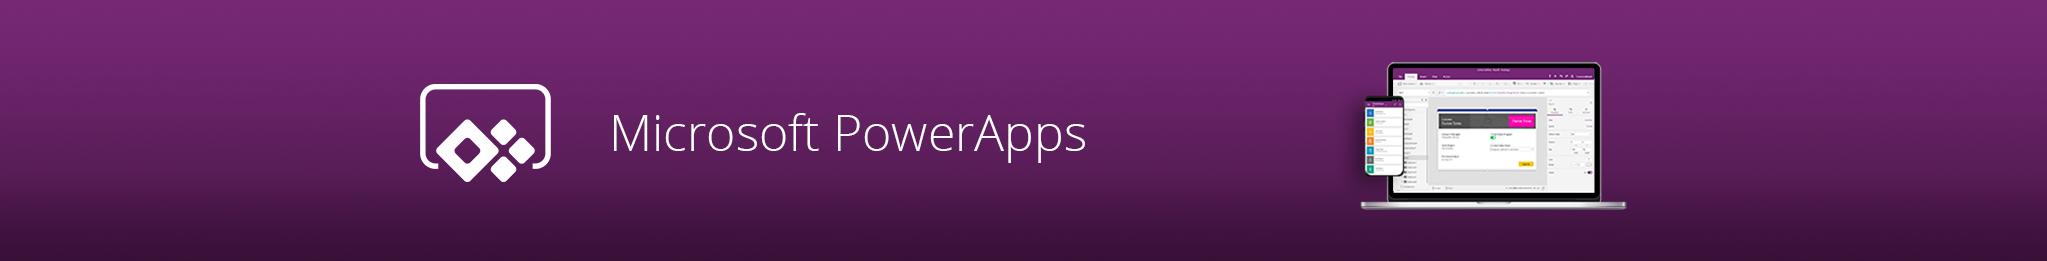 Banner PowerApps